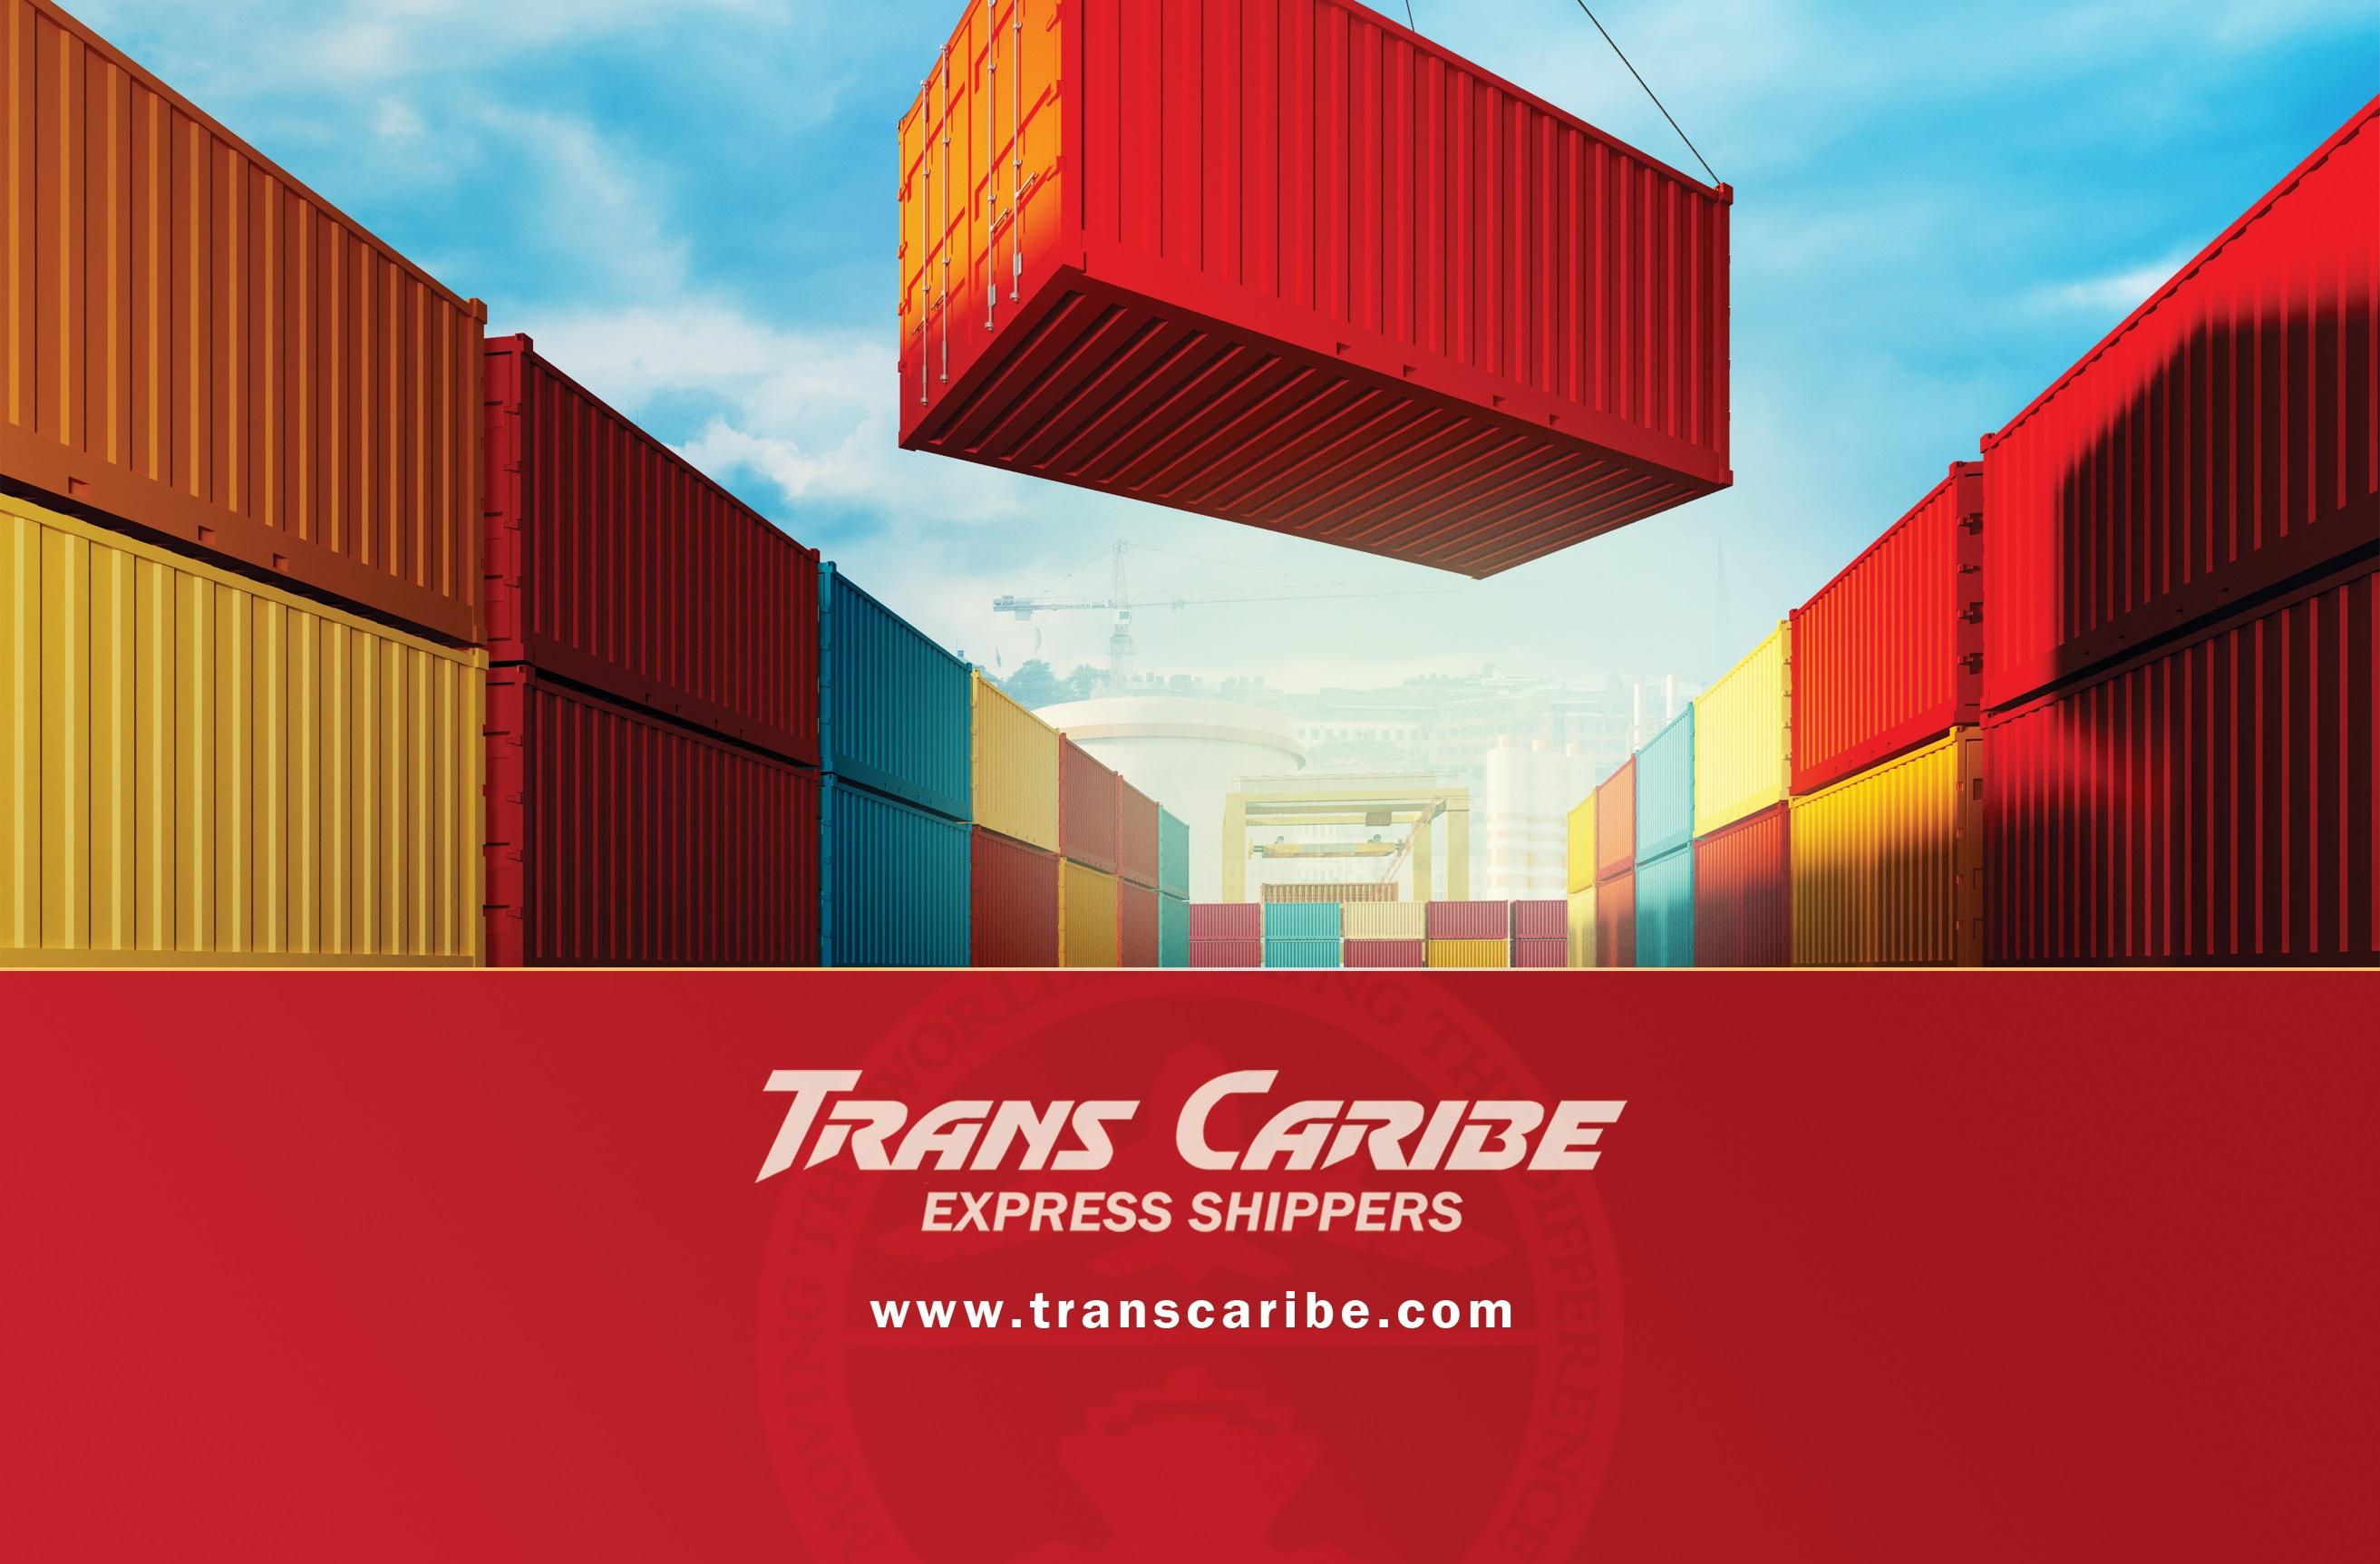 CONTACT - TransCaribe com - Trans Caribe Express Shippers, Inc